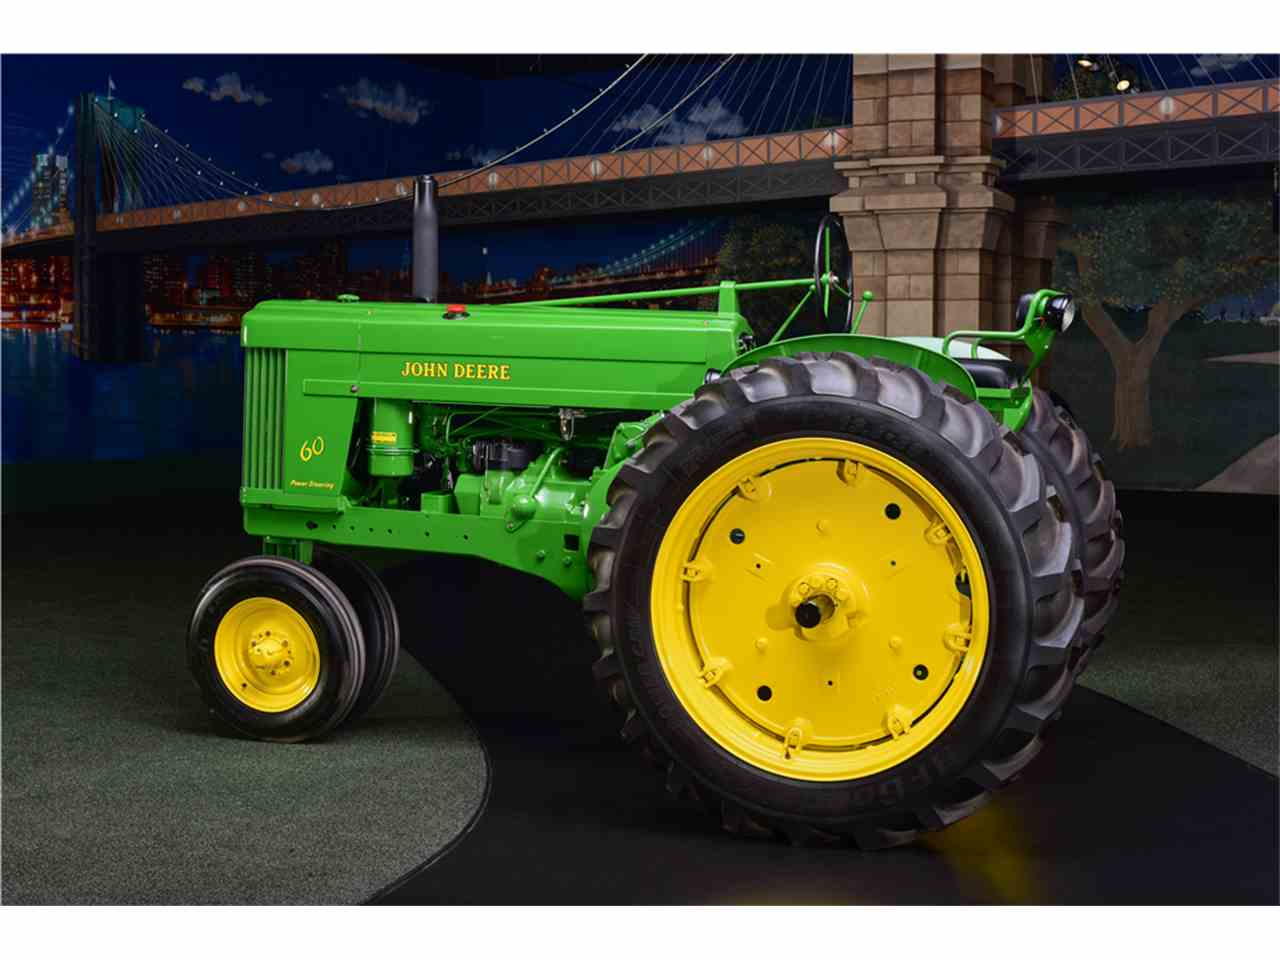 John Deere 60 Fenders : John deere tractor for sale classiccars cc